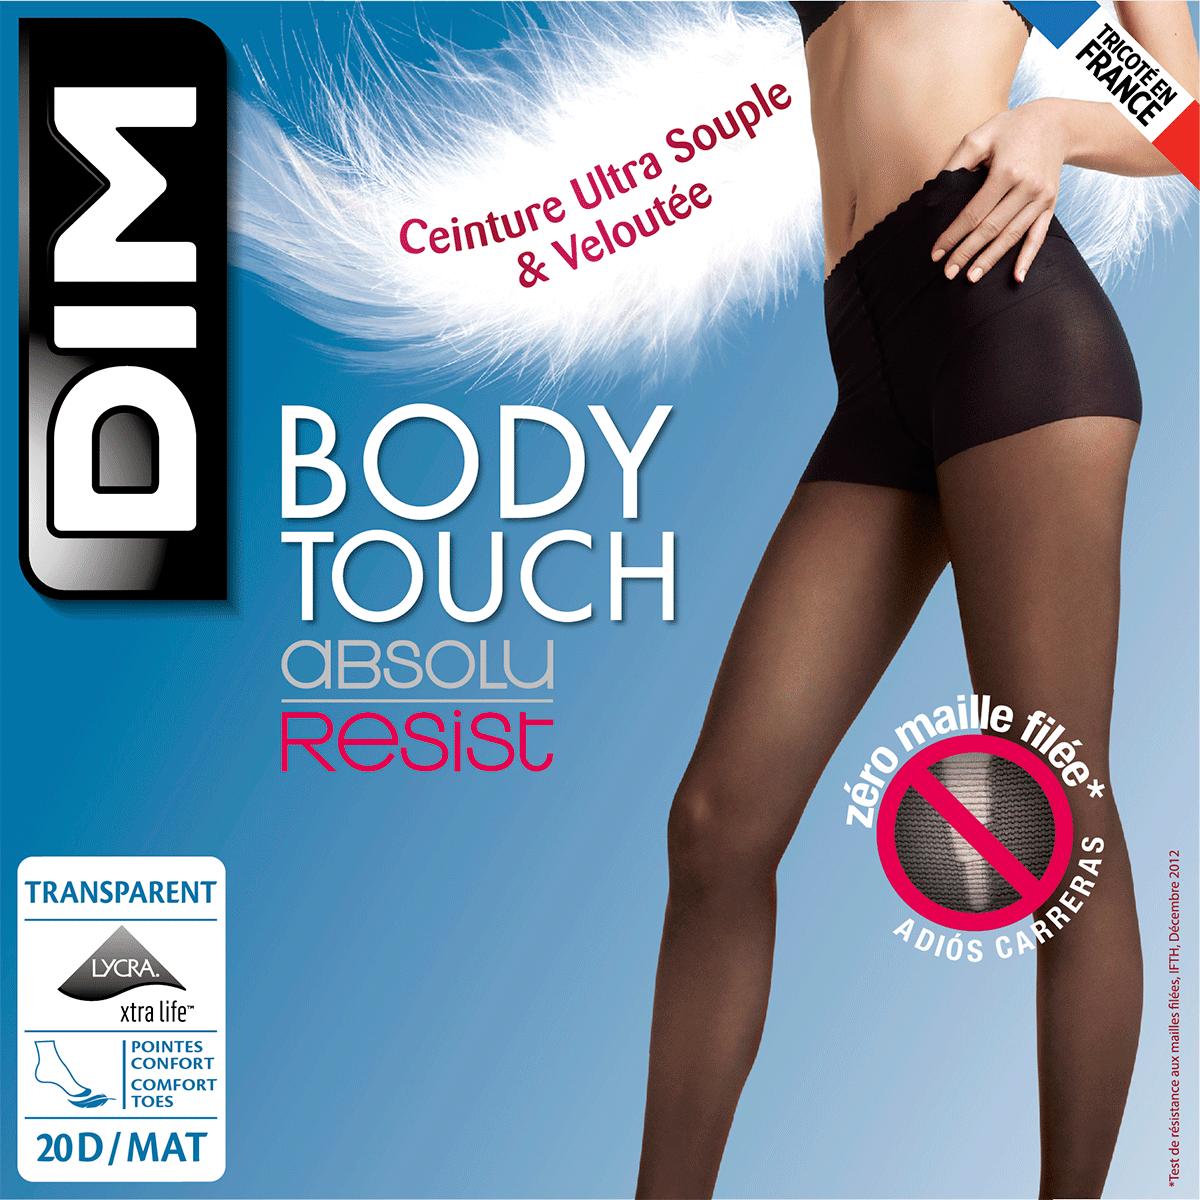 Body Touch Absolu Resist 20 ladder resist tights in black 35223c52cd0